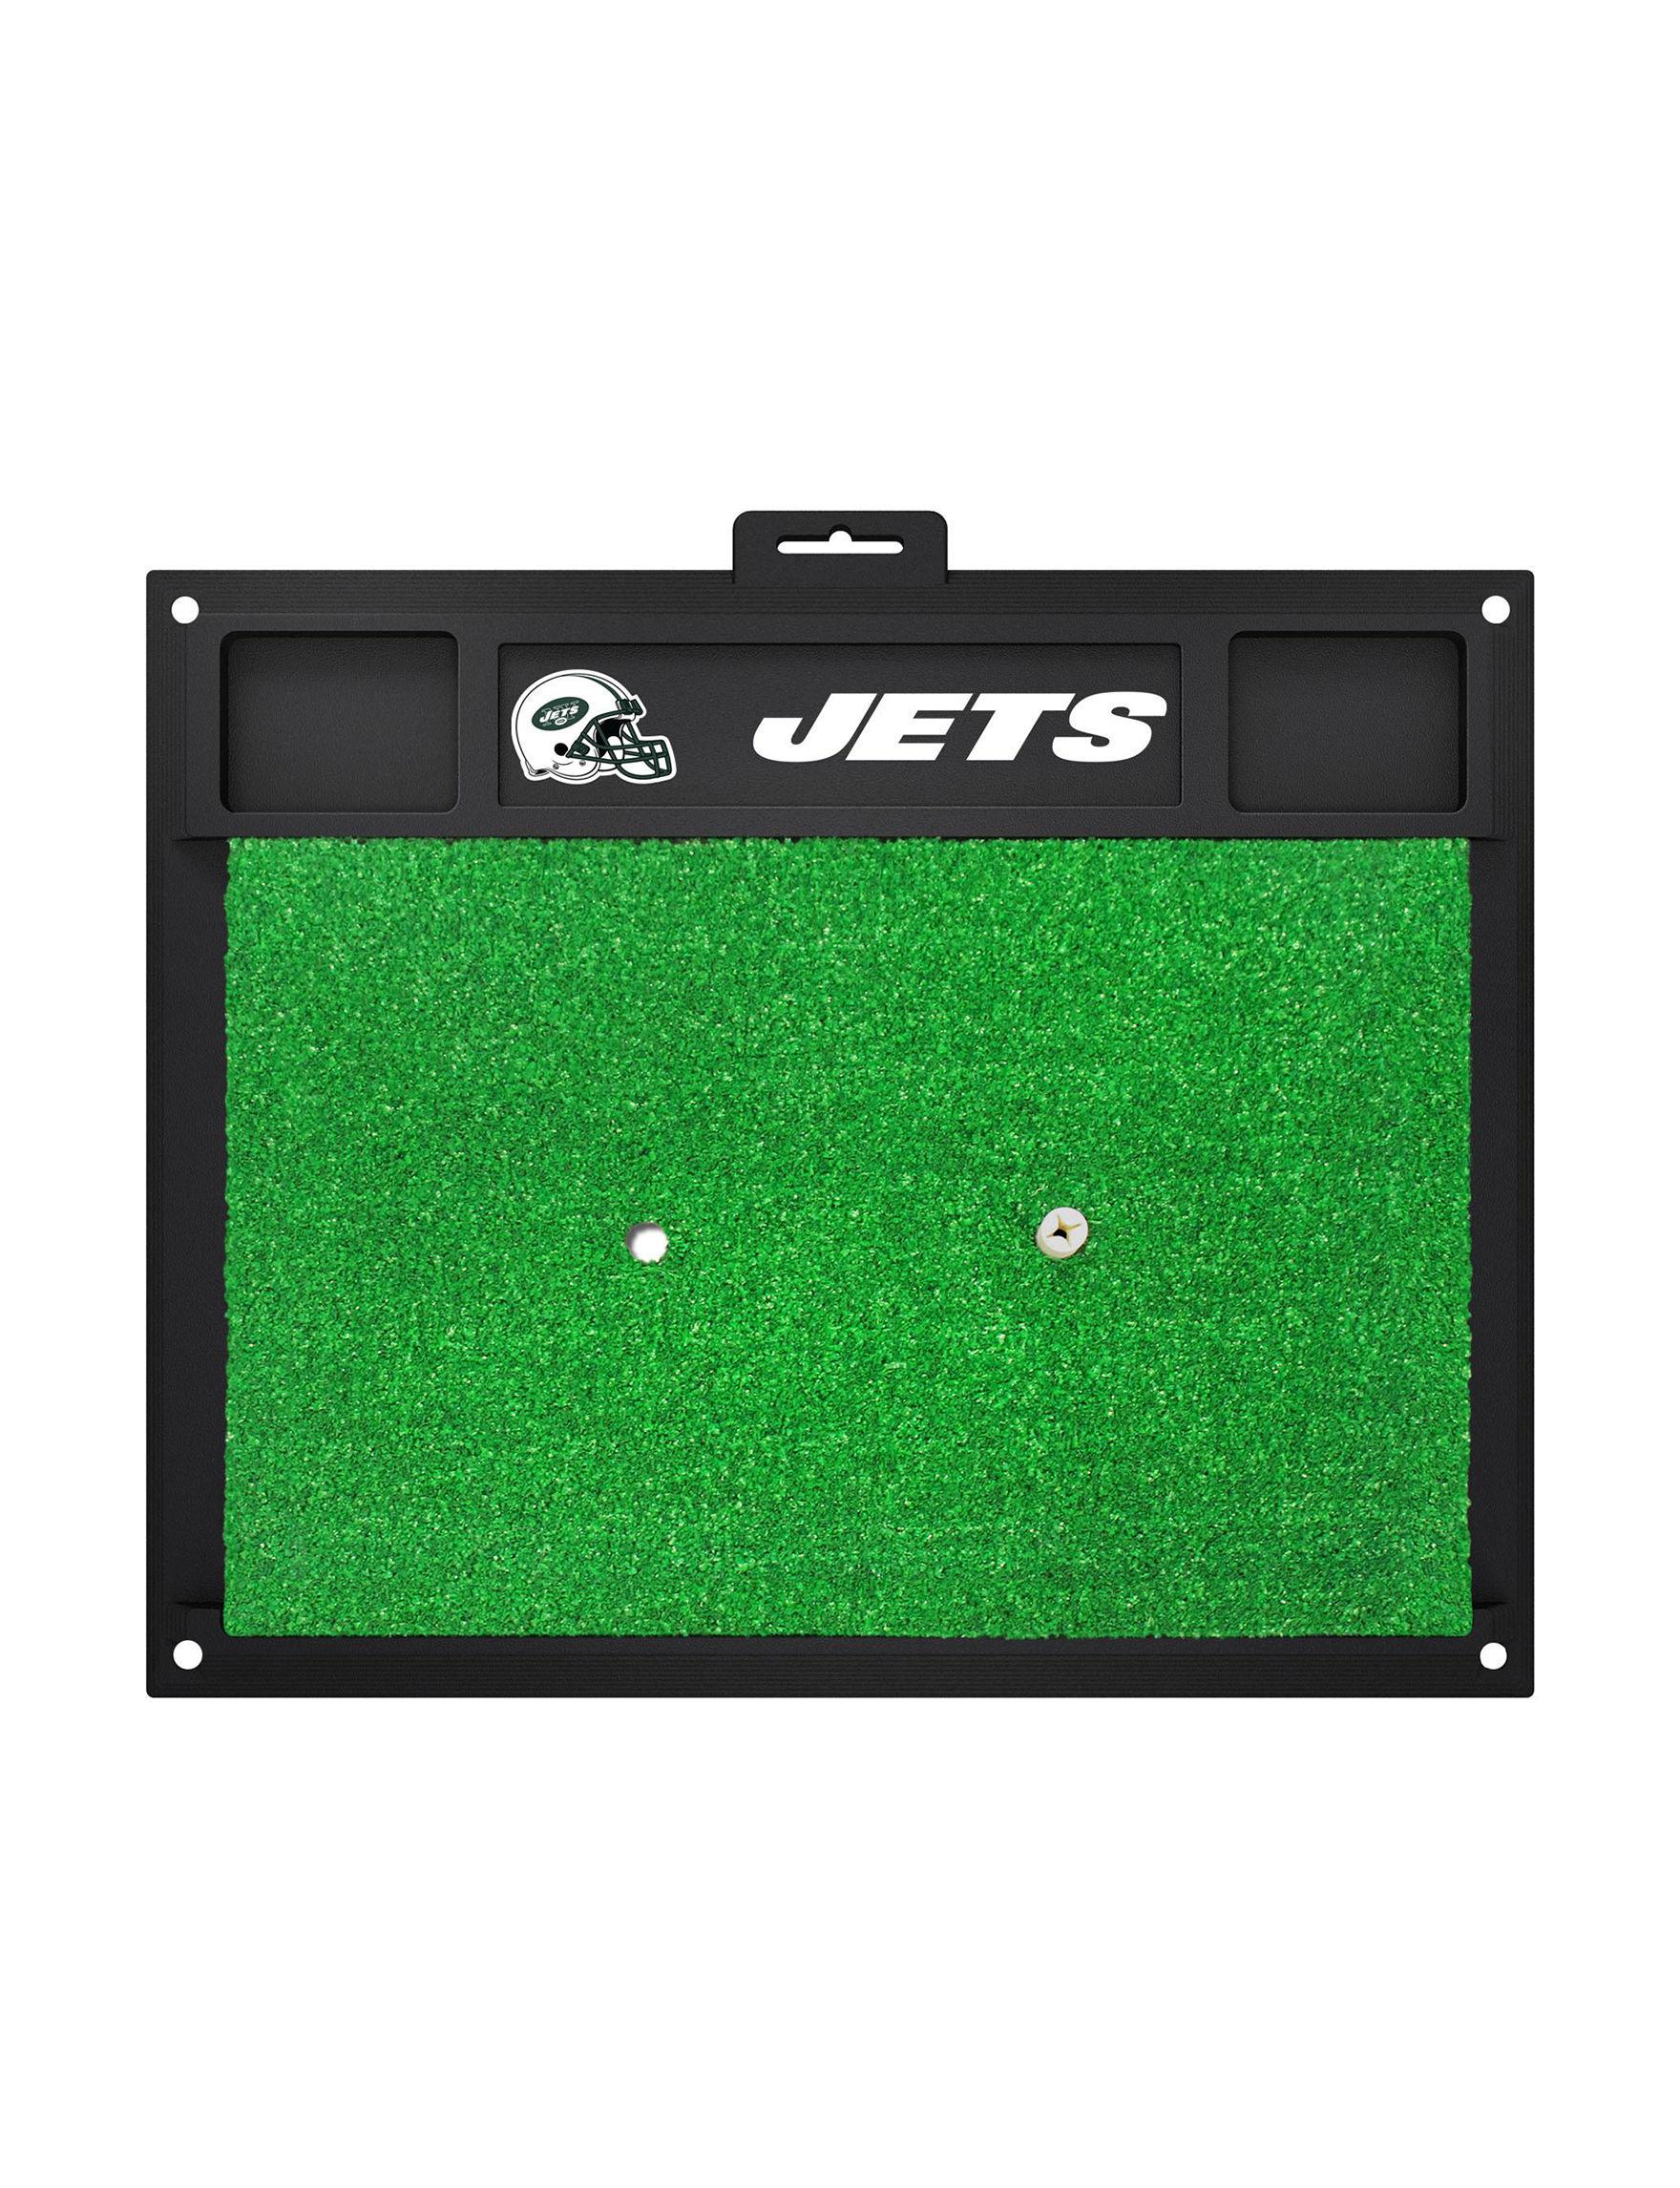 Fanmats Green / White Outdoor Rugs & Doormats Outdoor Decor